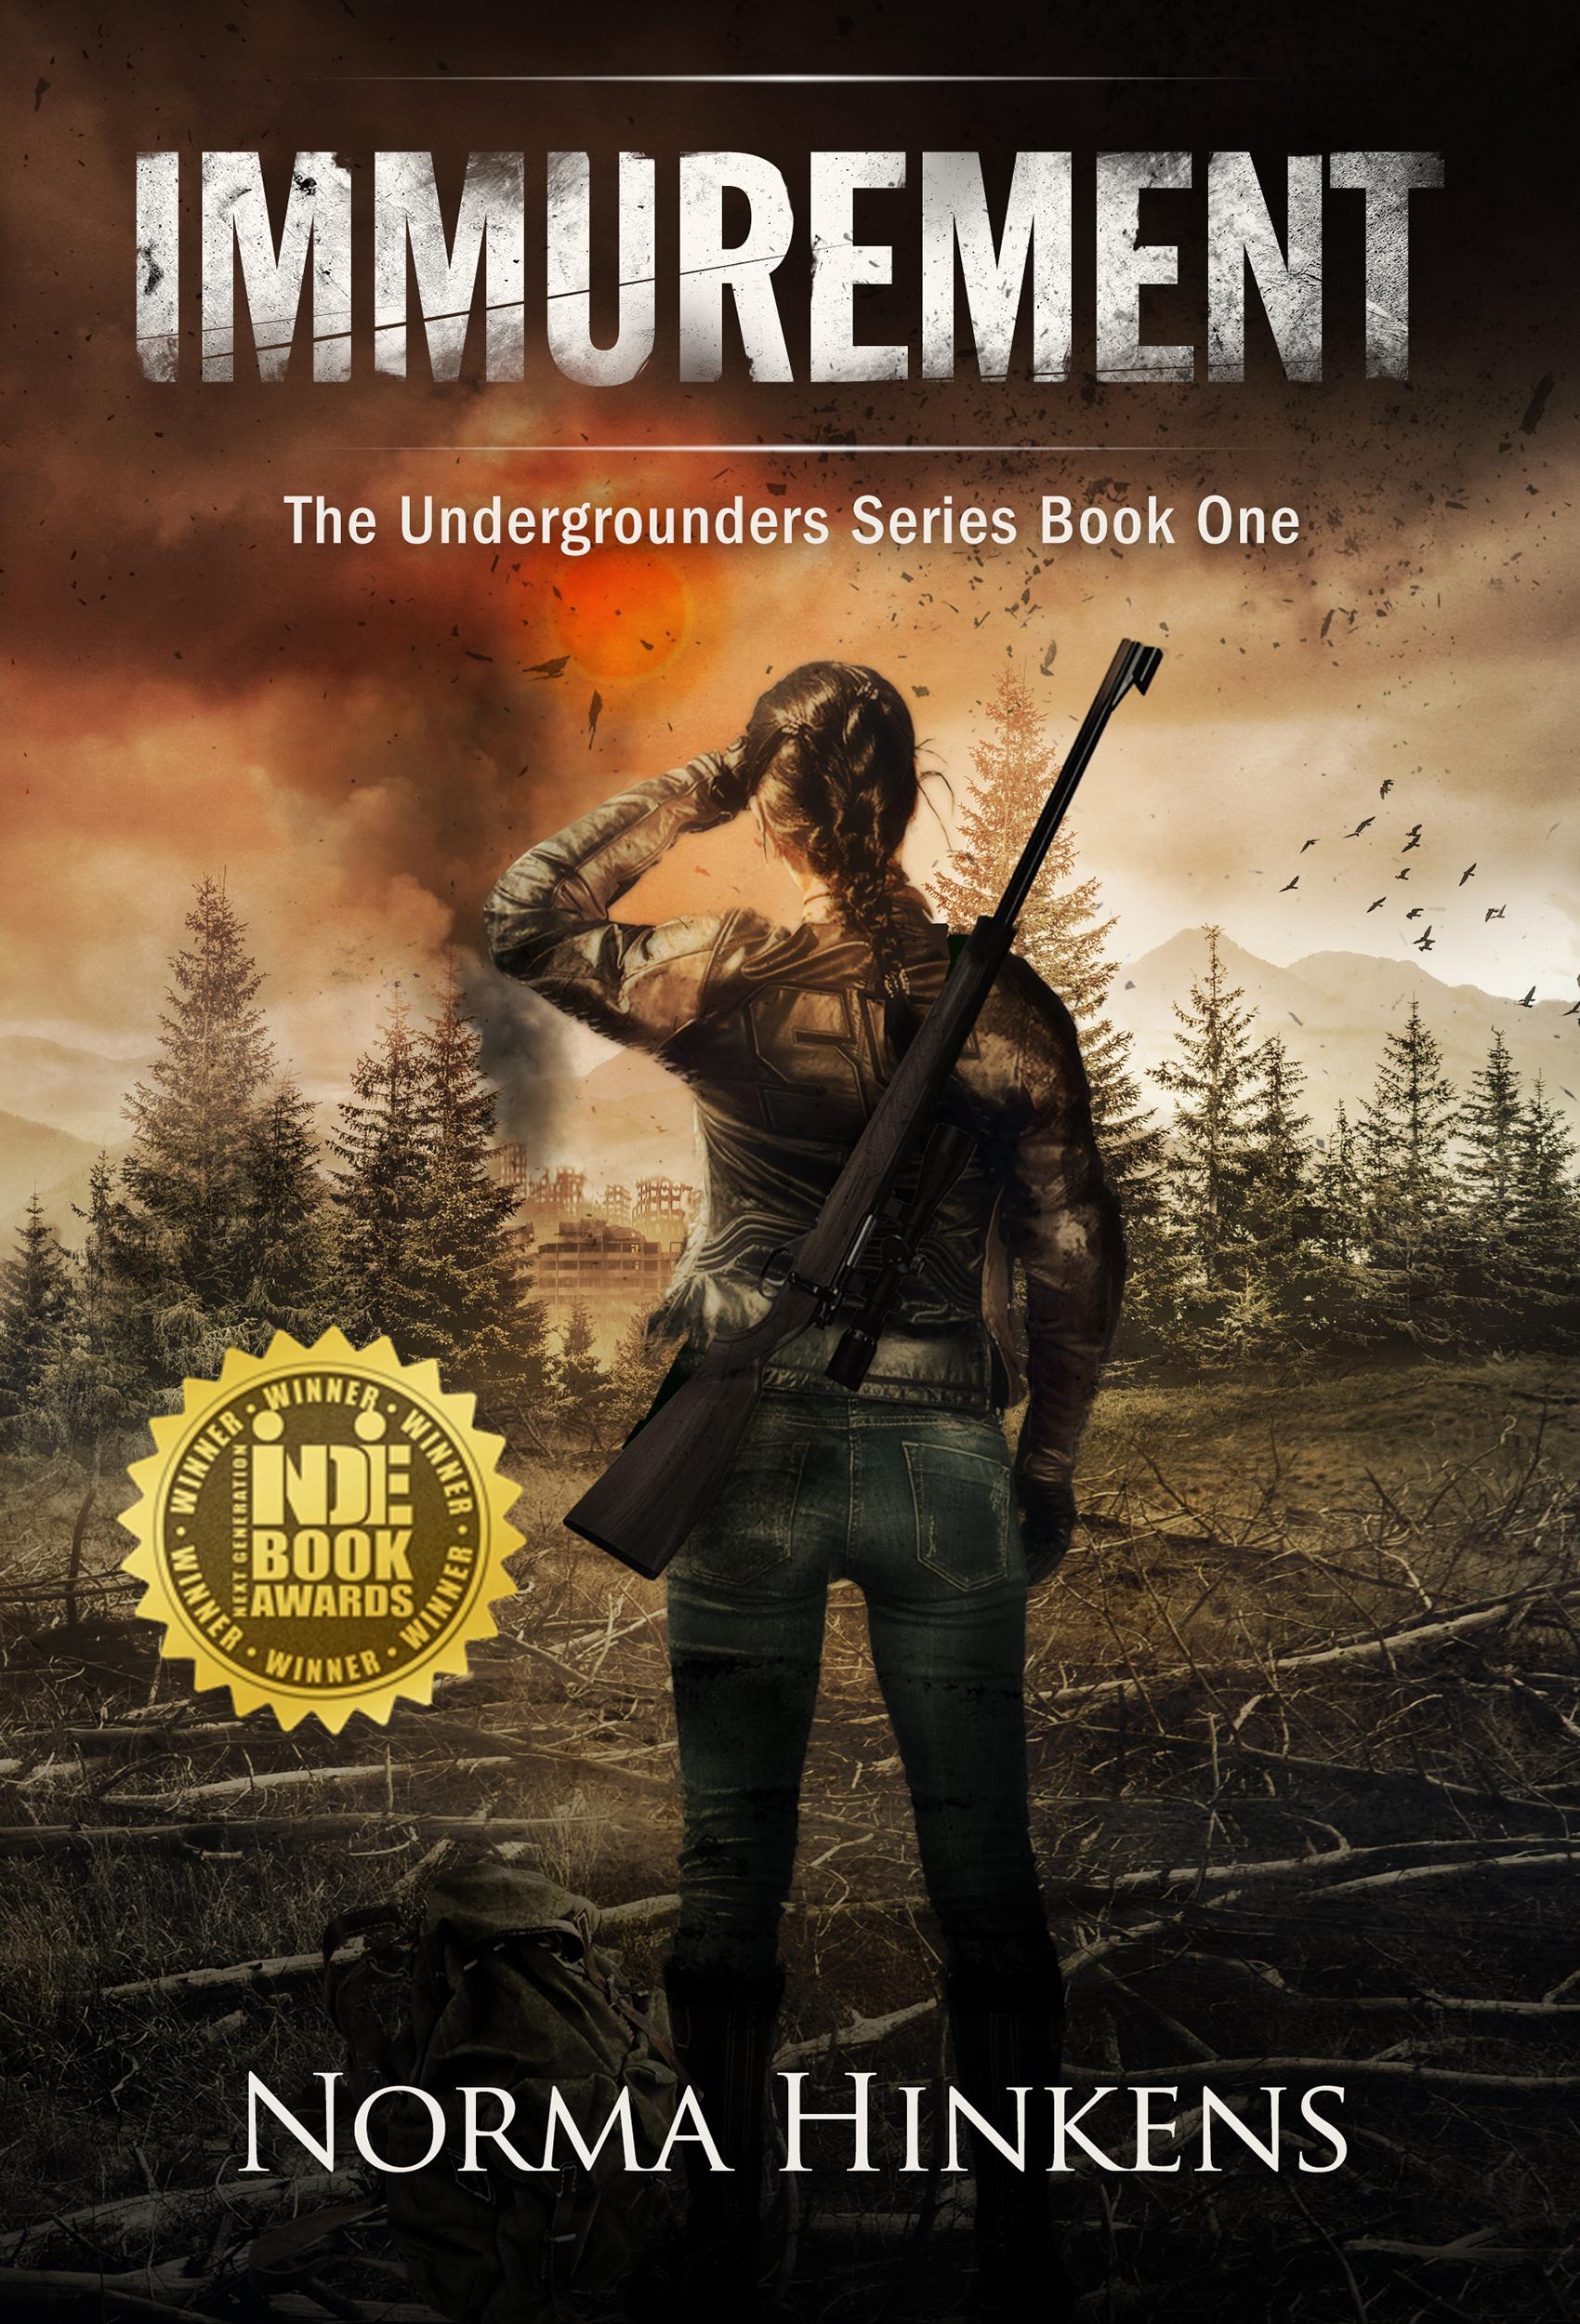 Immurement: The Undergrounders Series Book One